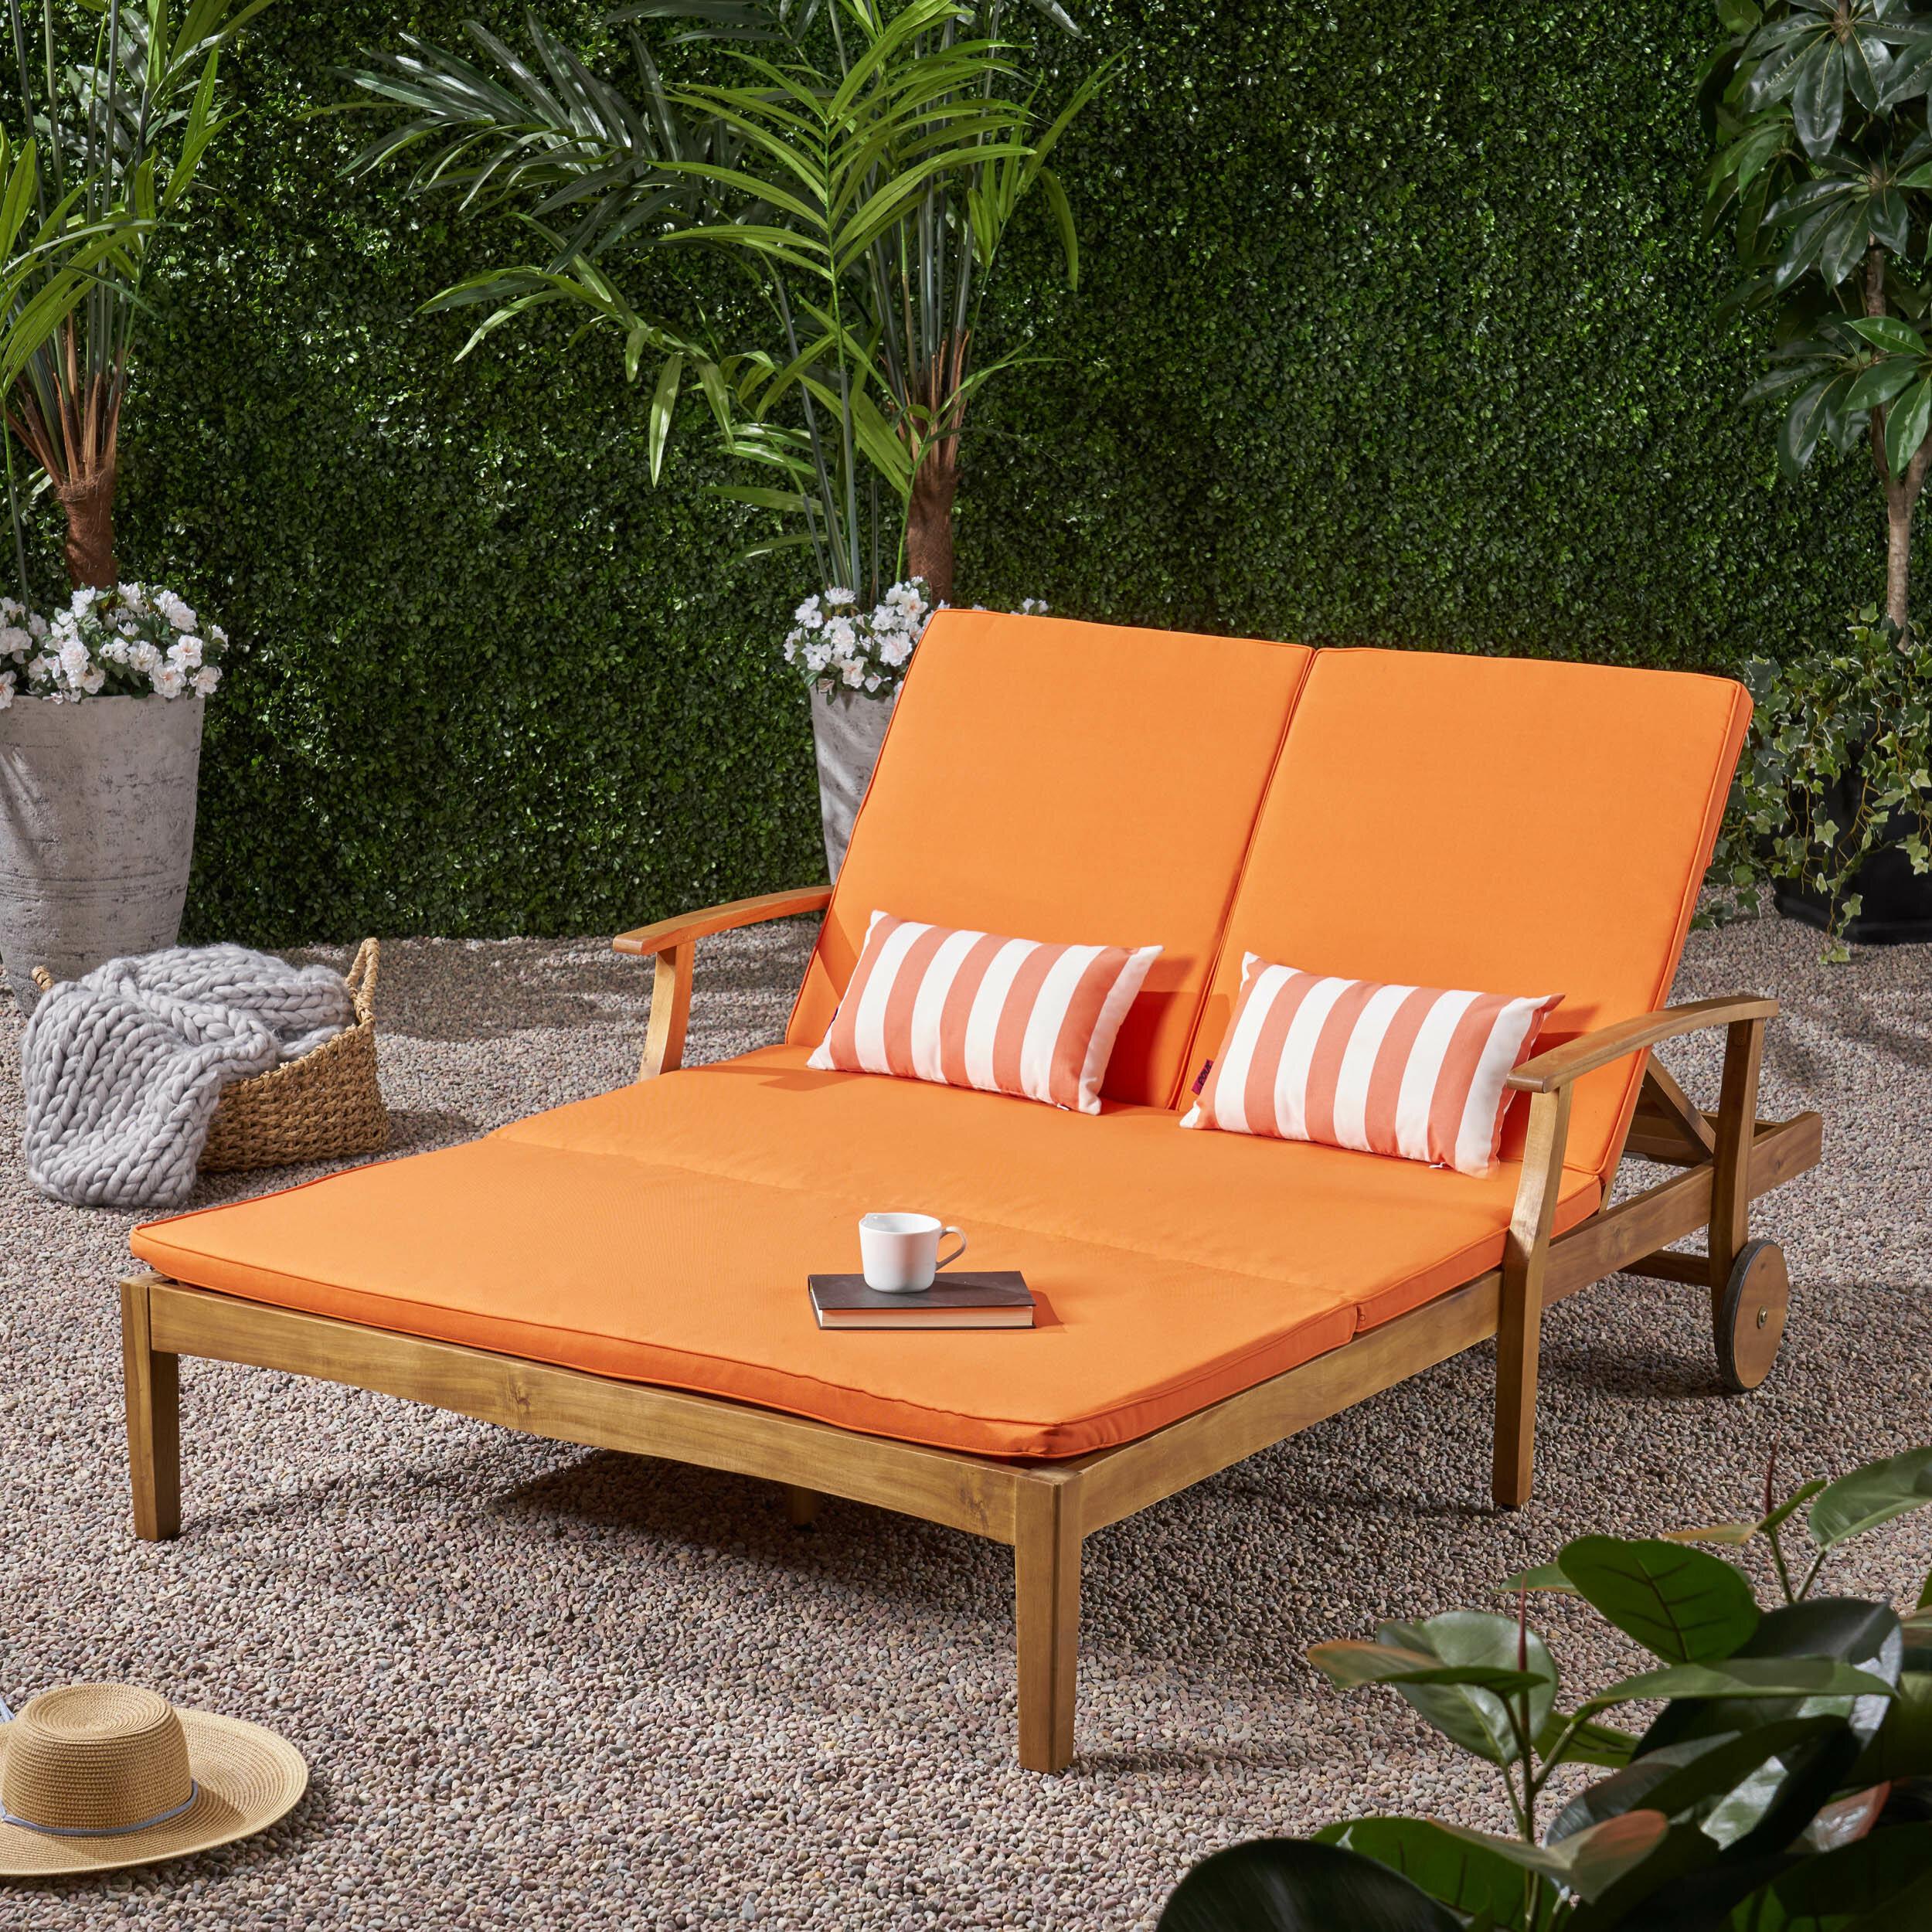 Phenomenal Antonia Double Reclining Teak Chaise Lounge With Cushion Bralicious Painted Fabric Chair Ideas Braliciousco